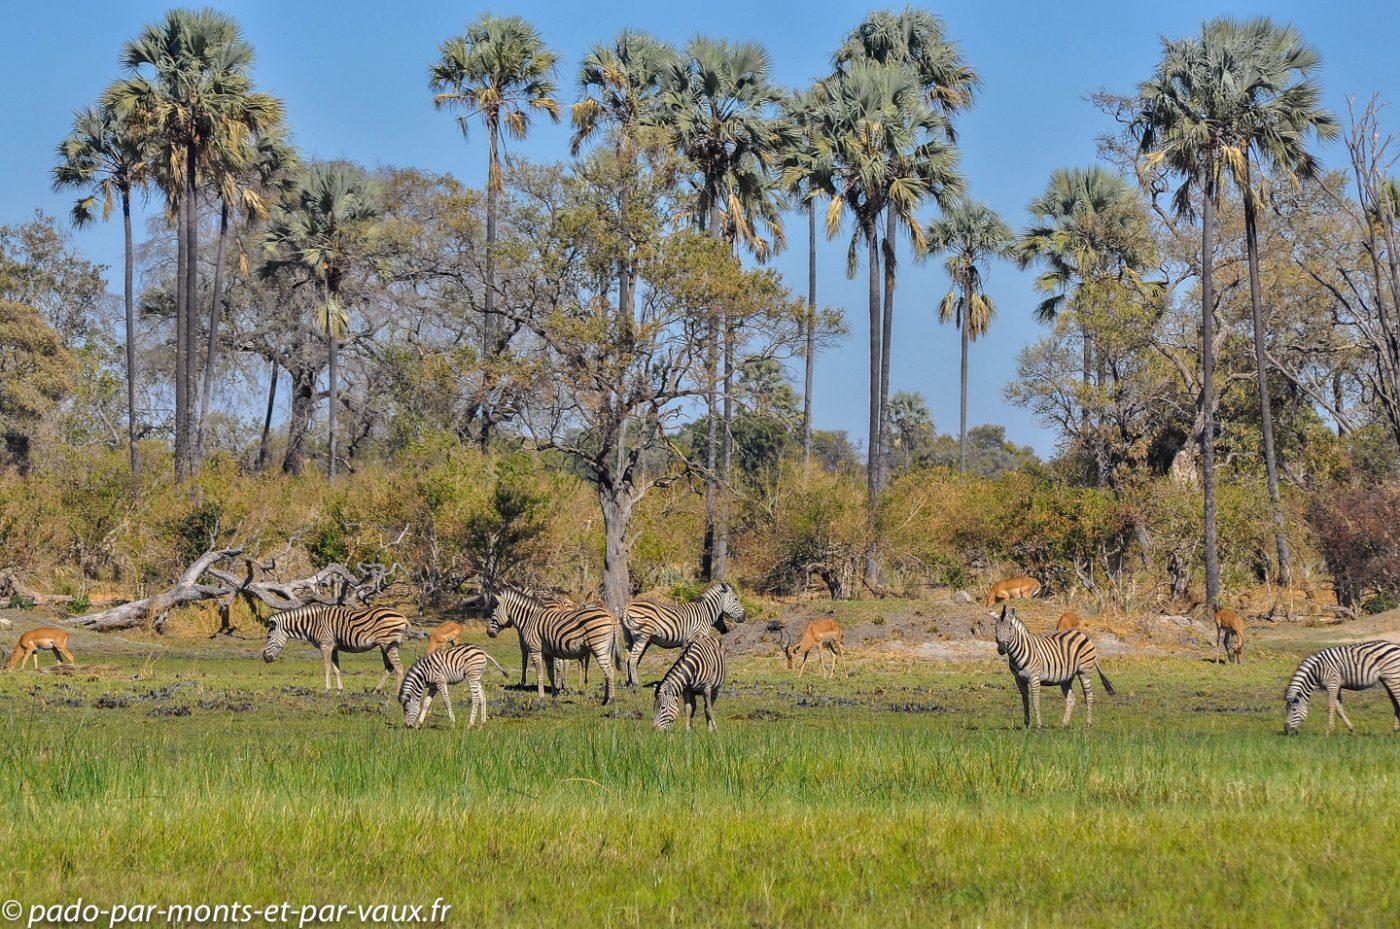 Gunn's camp - Zèbres et impalas